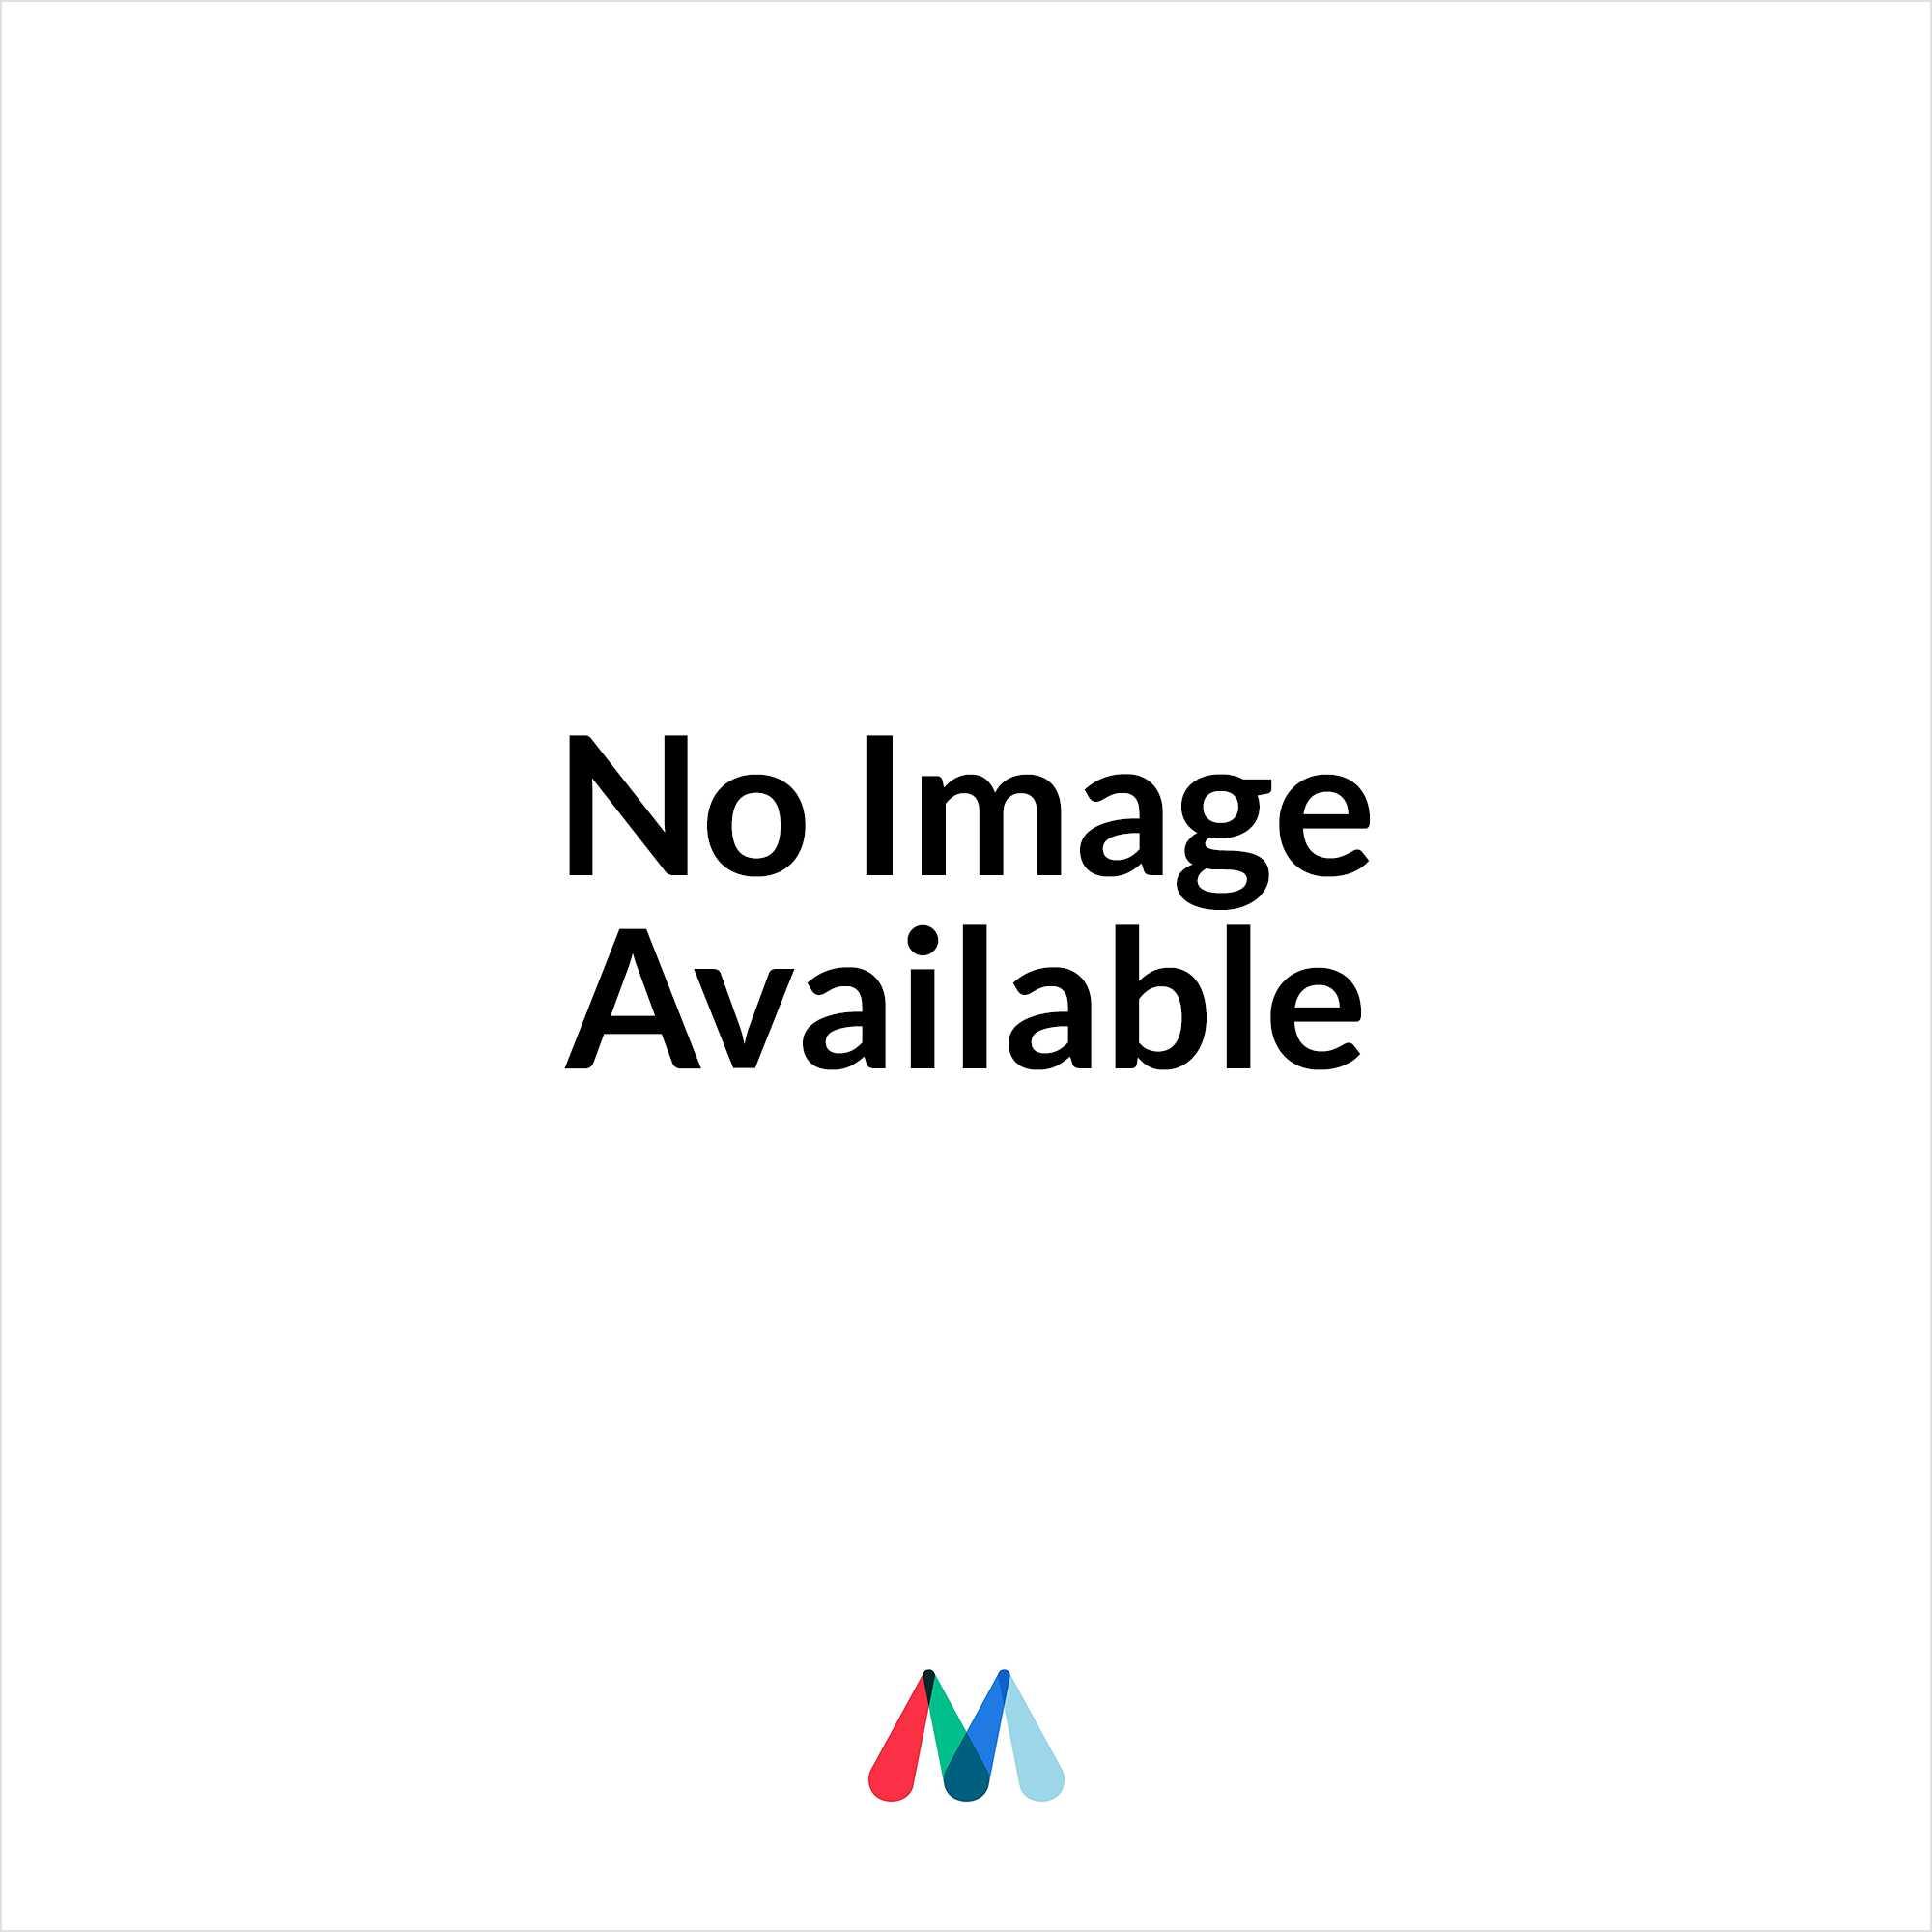 Tiffany Glass Dragonfly flame medium inverted 3 light pendant